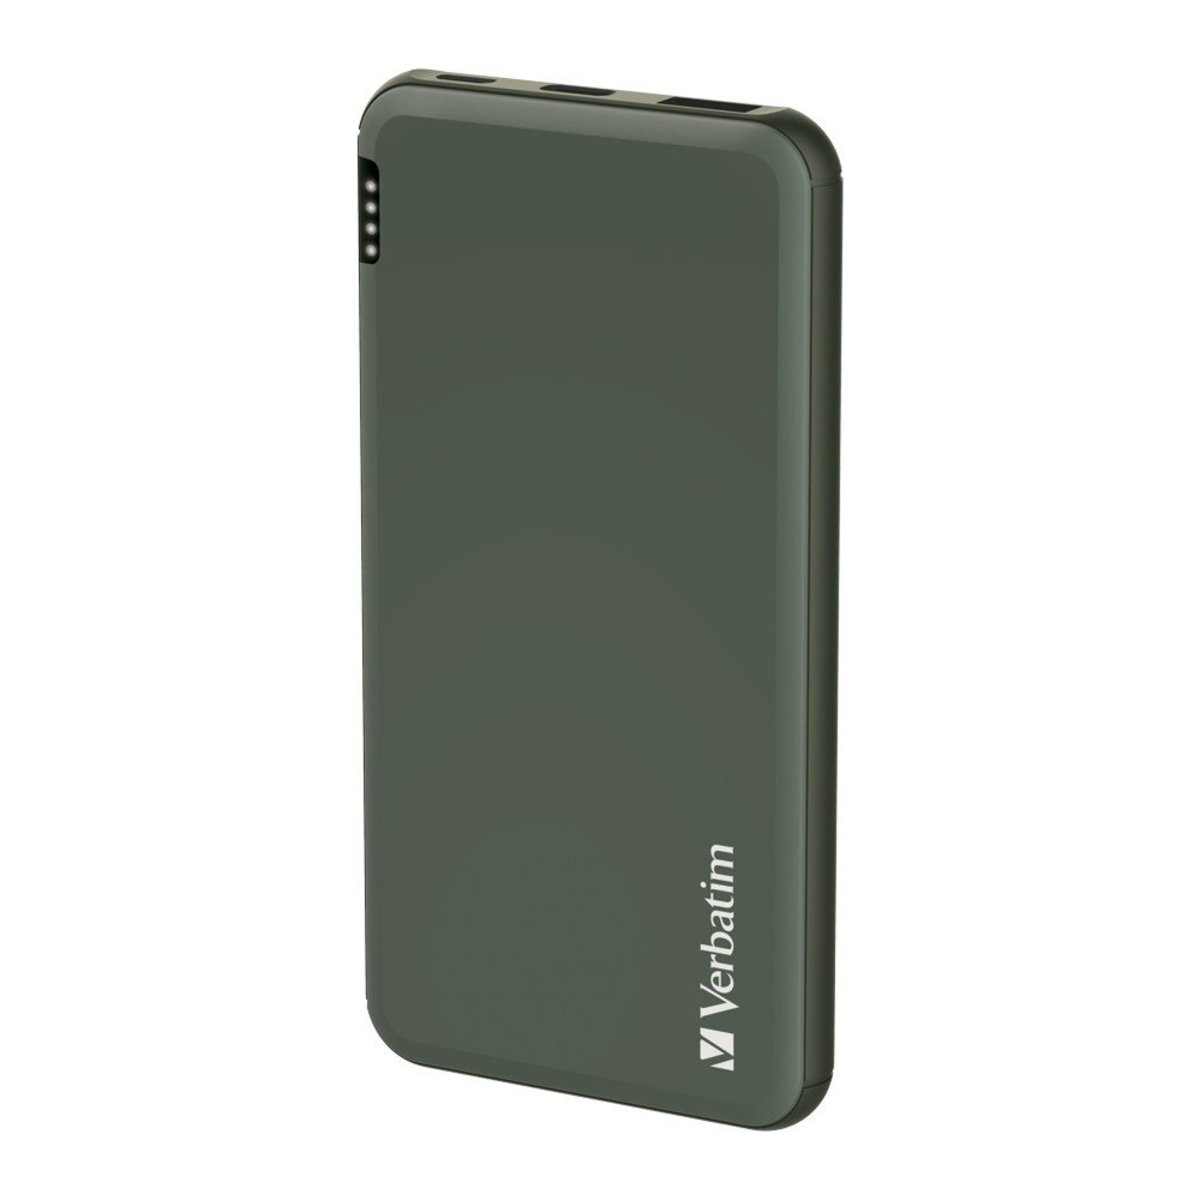 Metallic QC 3.0 & PD 18W 10000mAh Power Pack GREEN #66440 (HK Authorised Product)